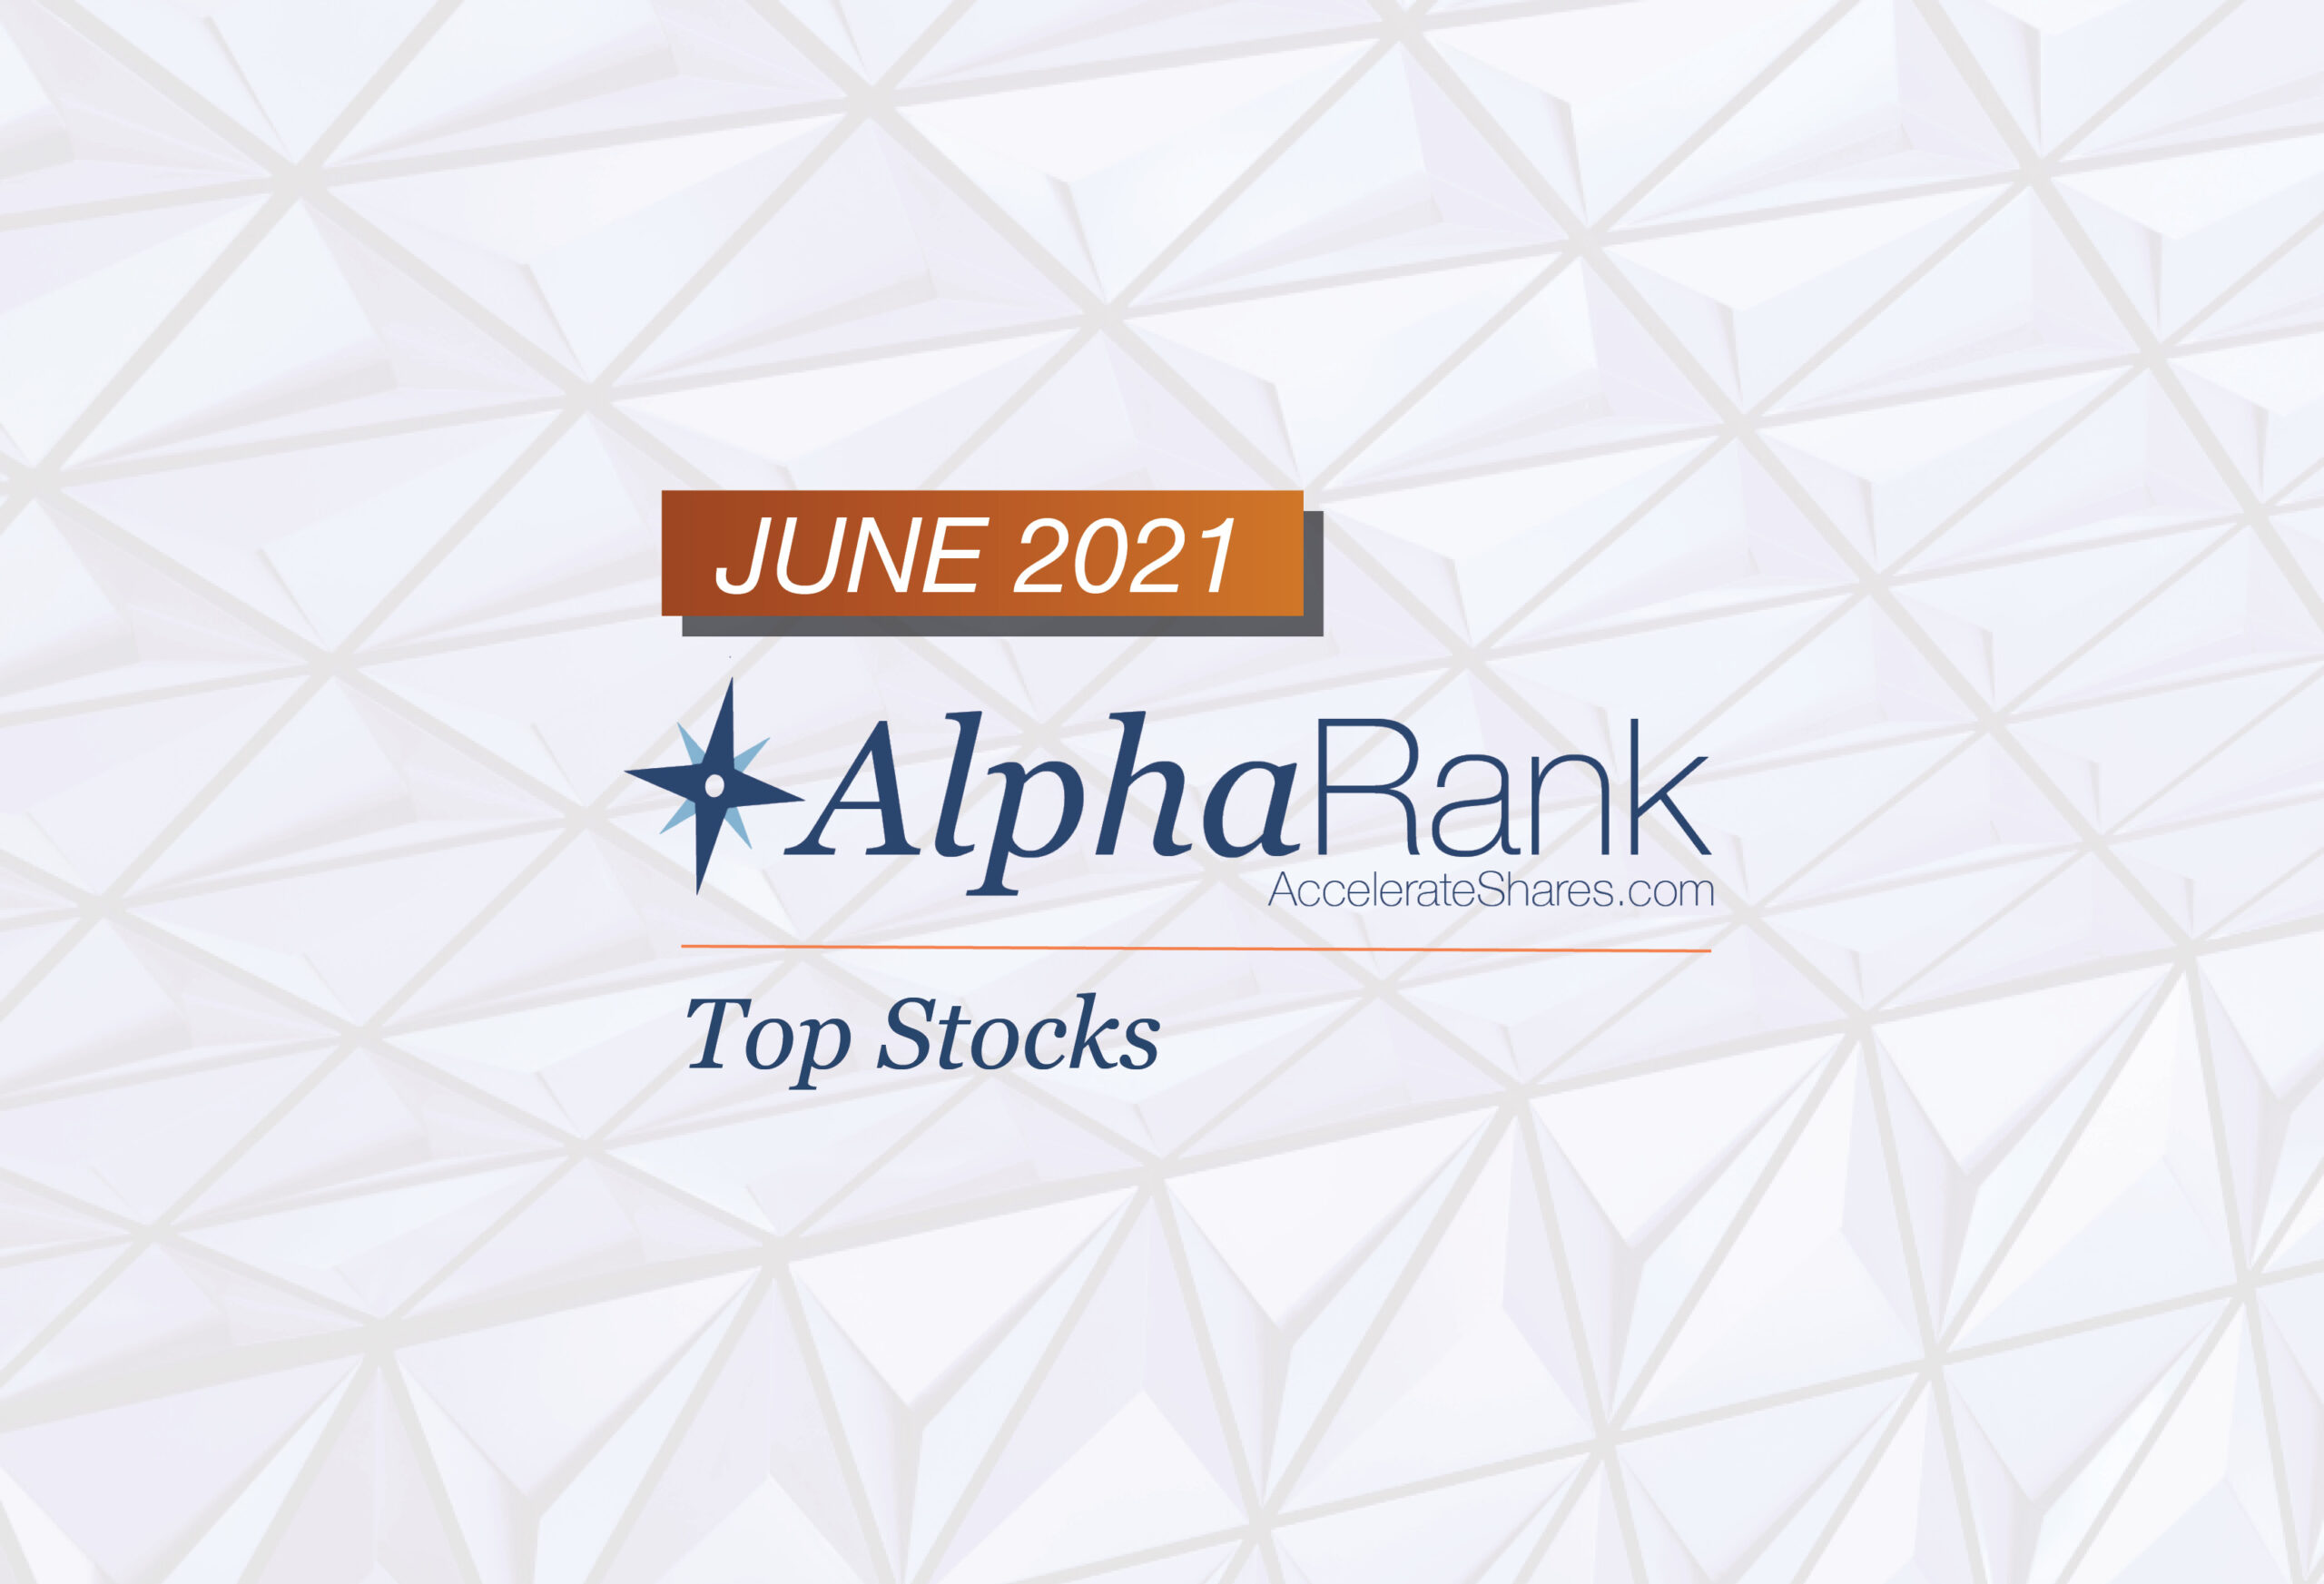 AlphaRank Top Stocks- June 2021